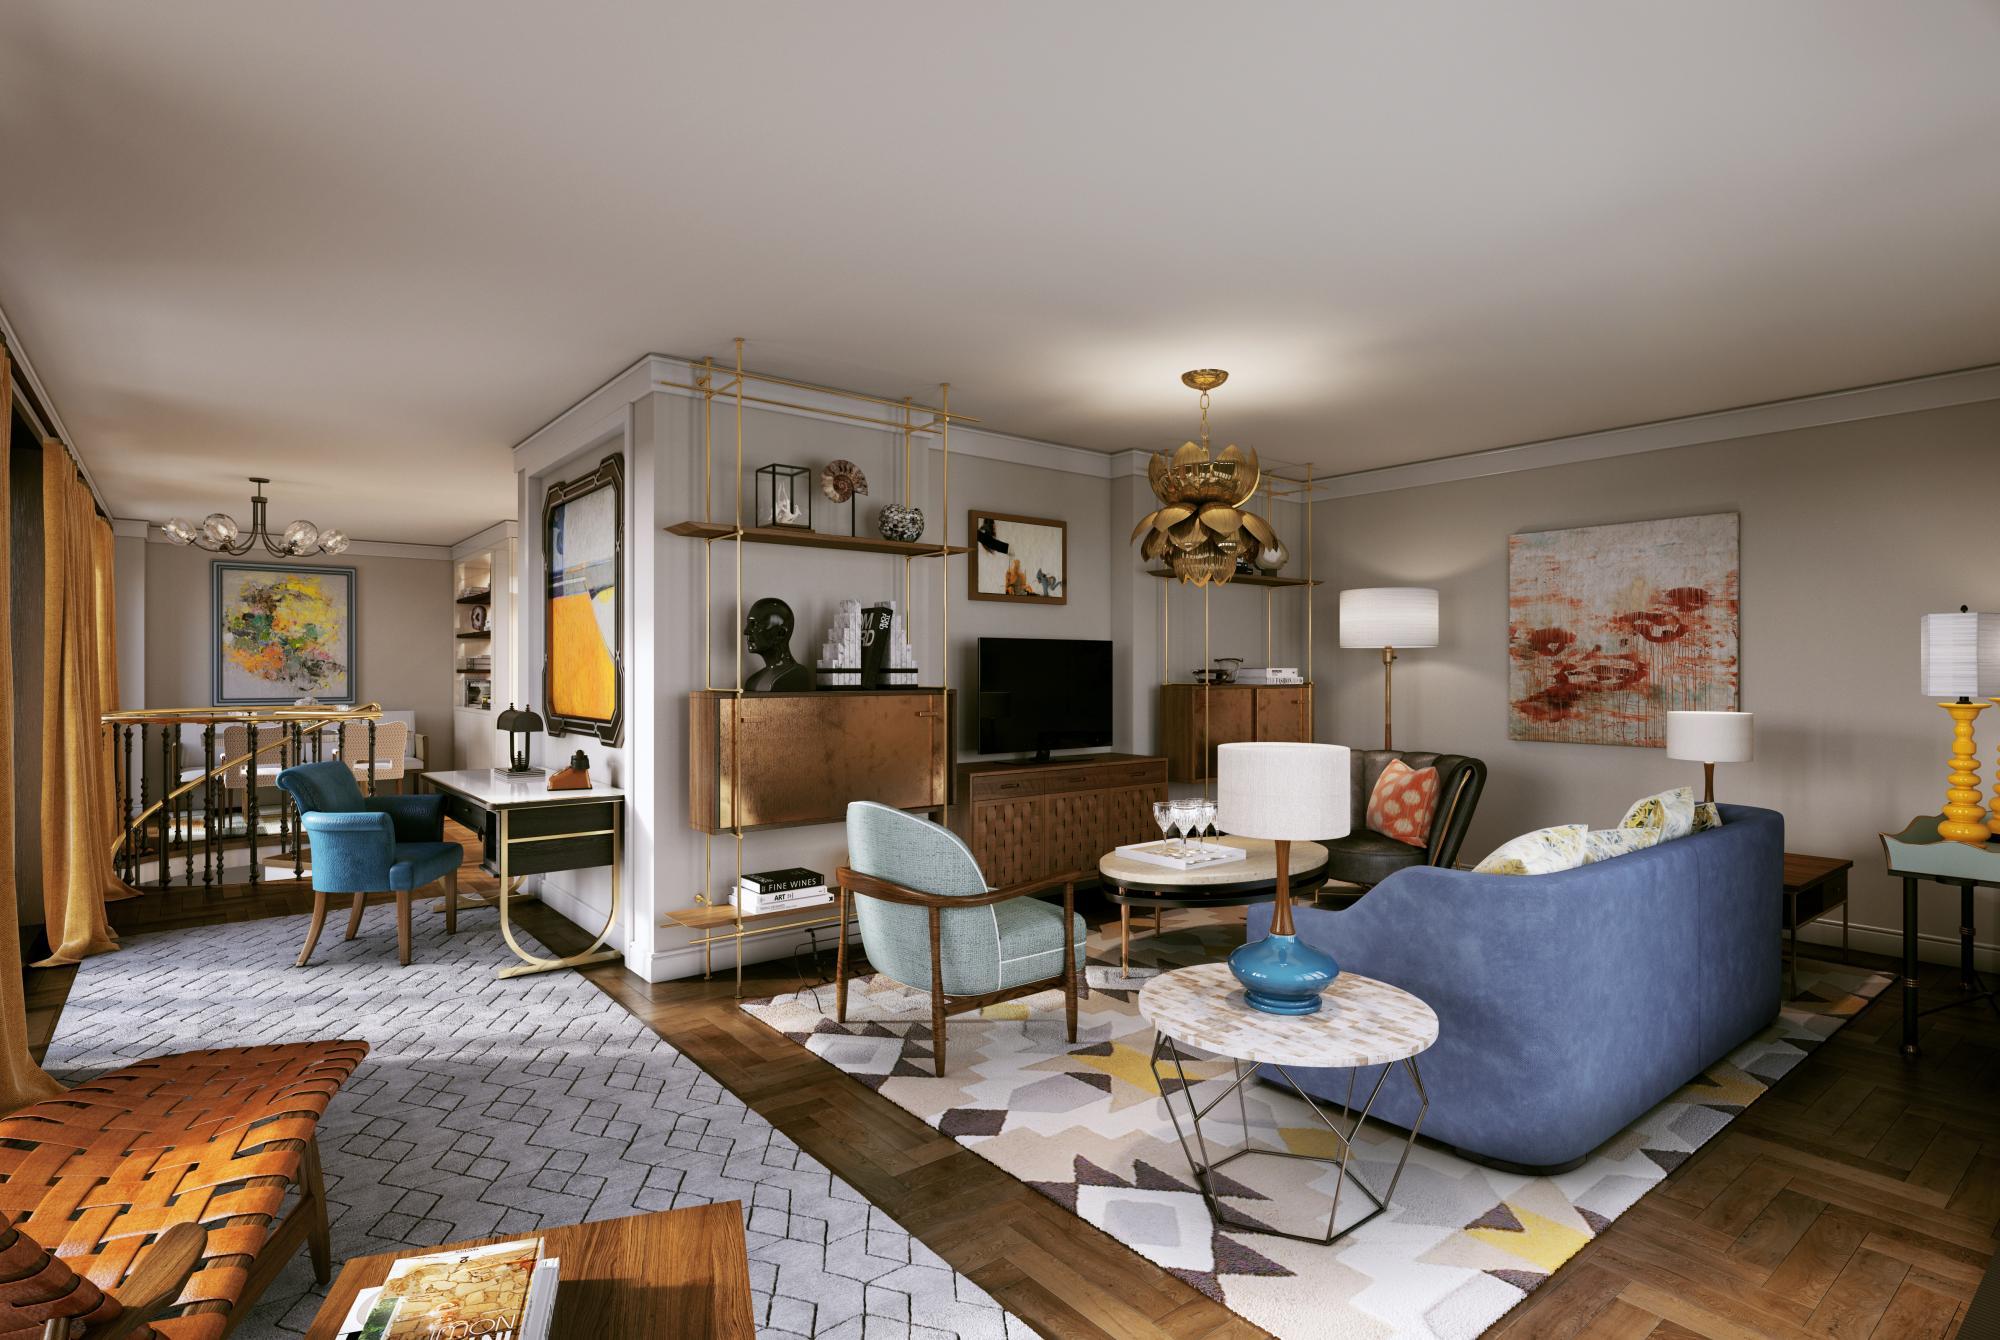 81 Dean Street Residence by Martin Brudnizki - Martin Brudnizki Design Studio - top interior designers - best interior designers in new york - top interior designers in nyc - top interior designers in london